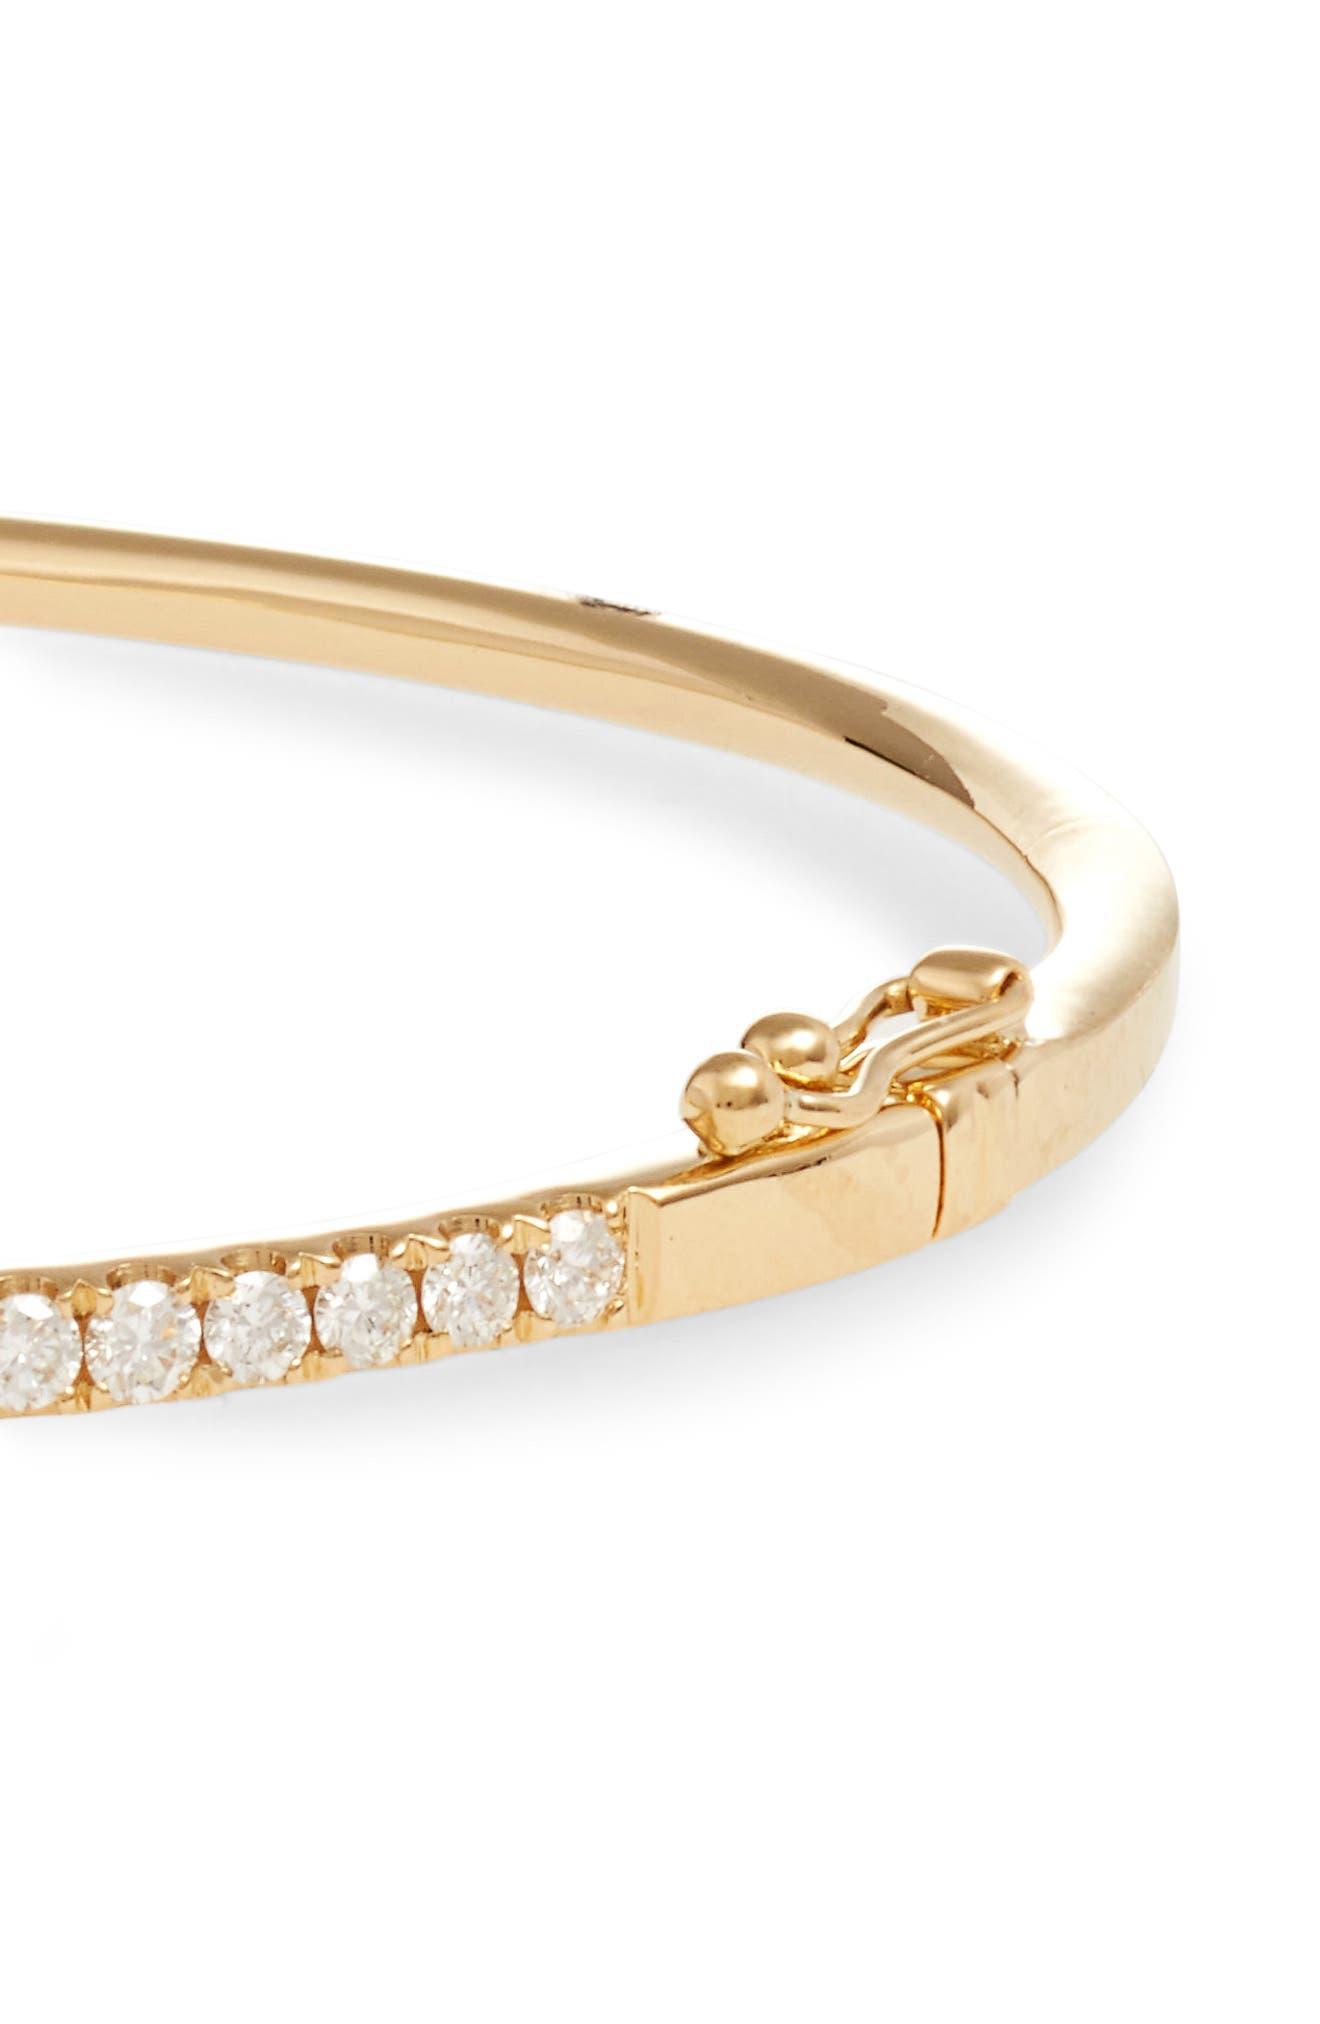 'Stackable' Large Skinny Diamond Bangle,                             Alternate thumbnail 4, color,                             YELLOW GOLD